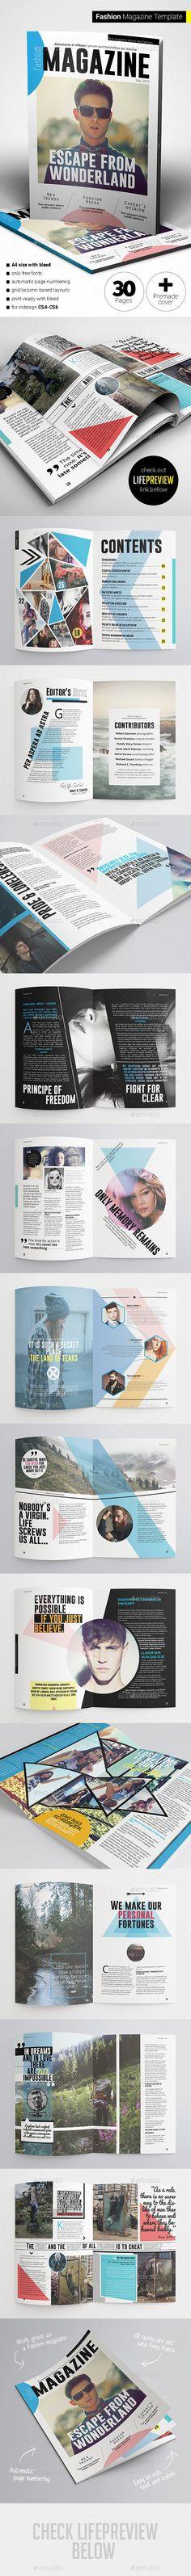 Fashion Magazine Template #design #journal Download: http://graphicriver.net/item/fashion-magazine/11383480?ref=ksioks